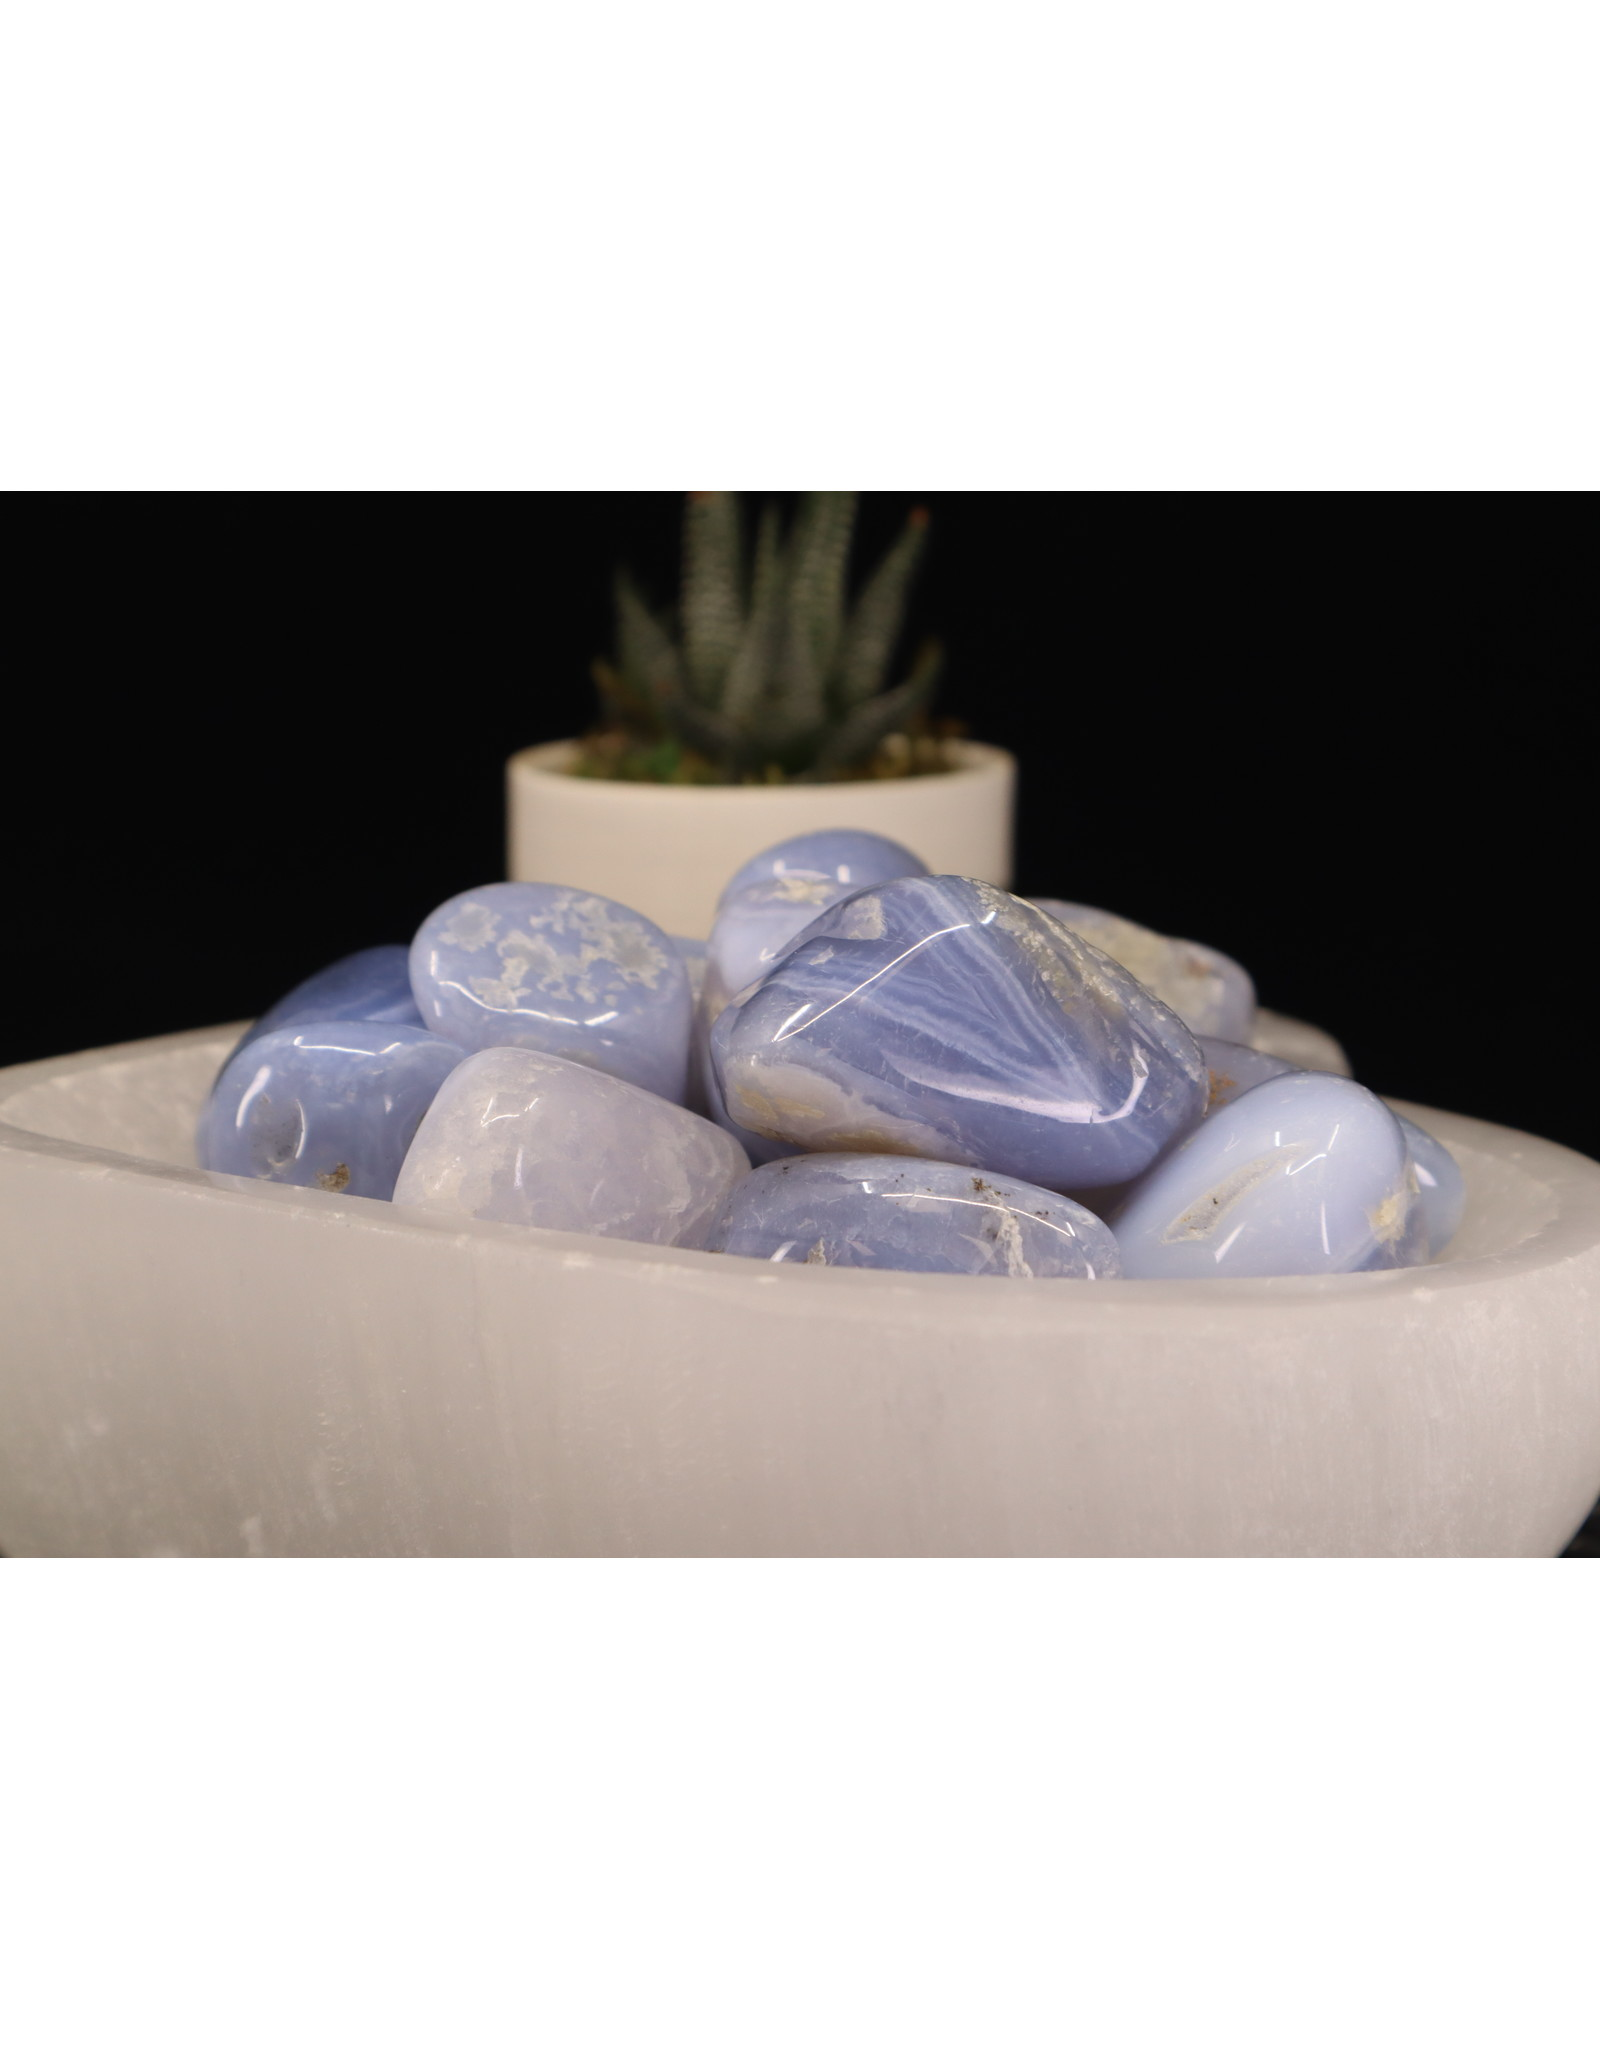 Blue Lace Agate XL Tumbled